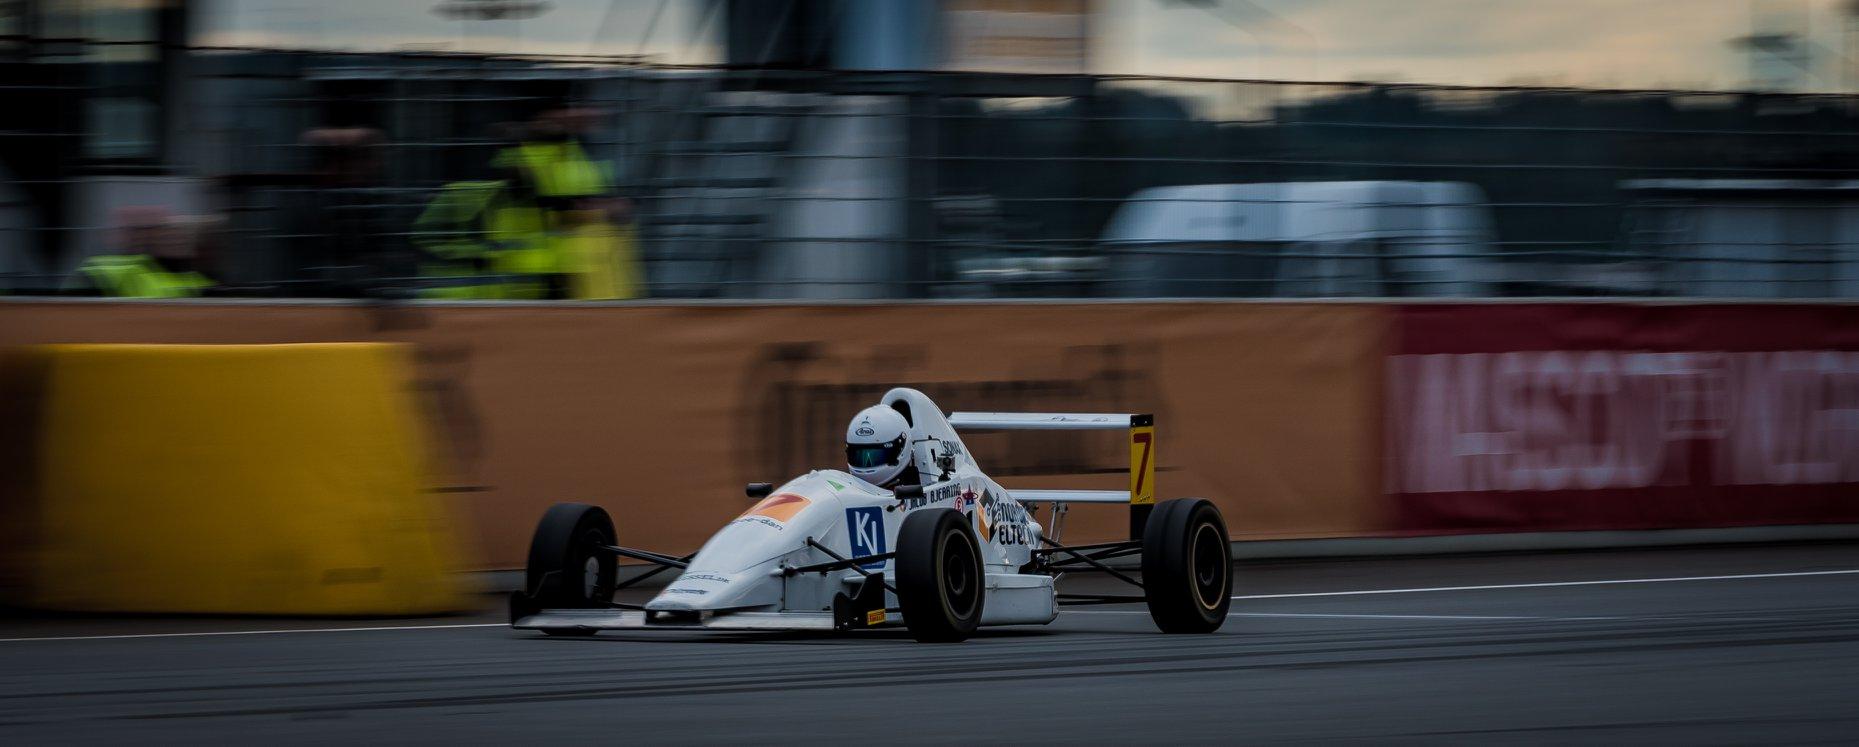 Jacob Saabye Bjerring Formel 5